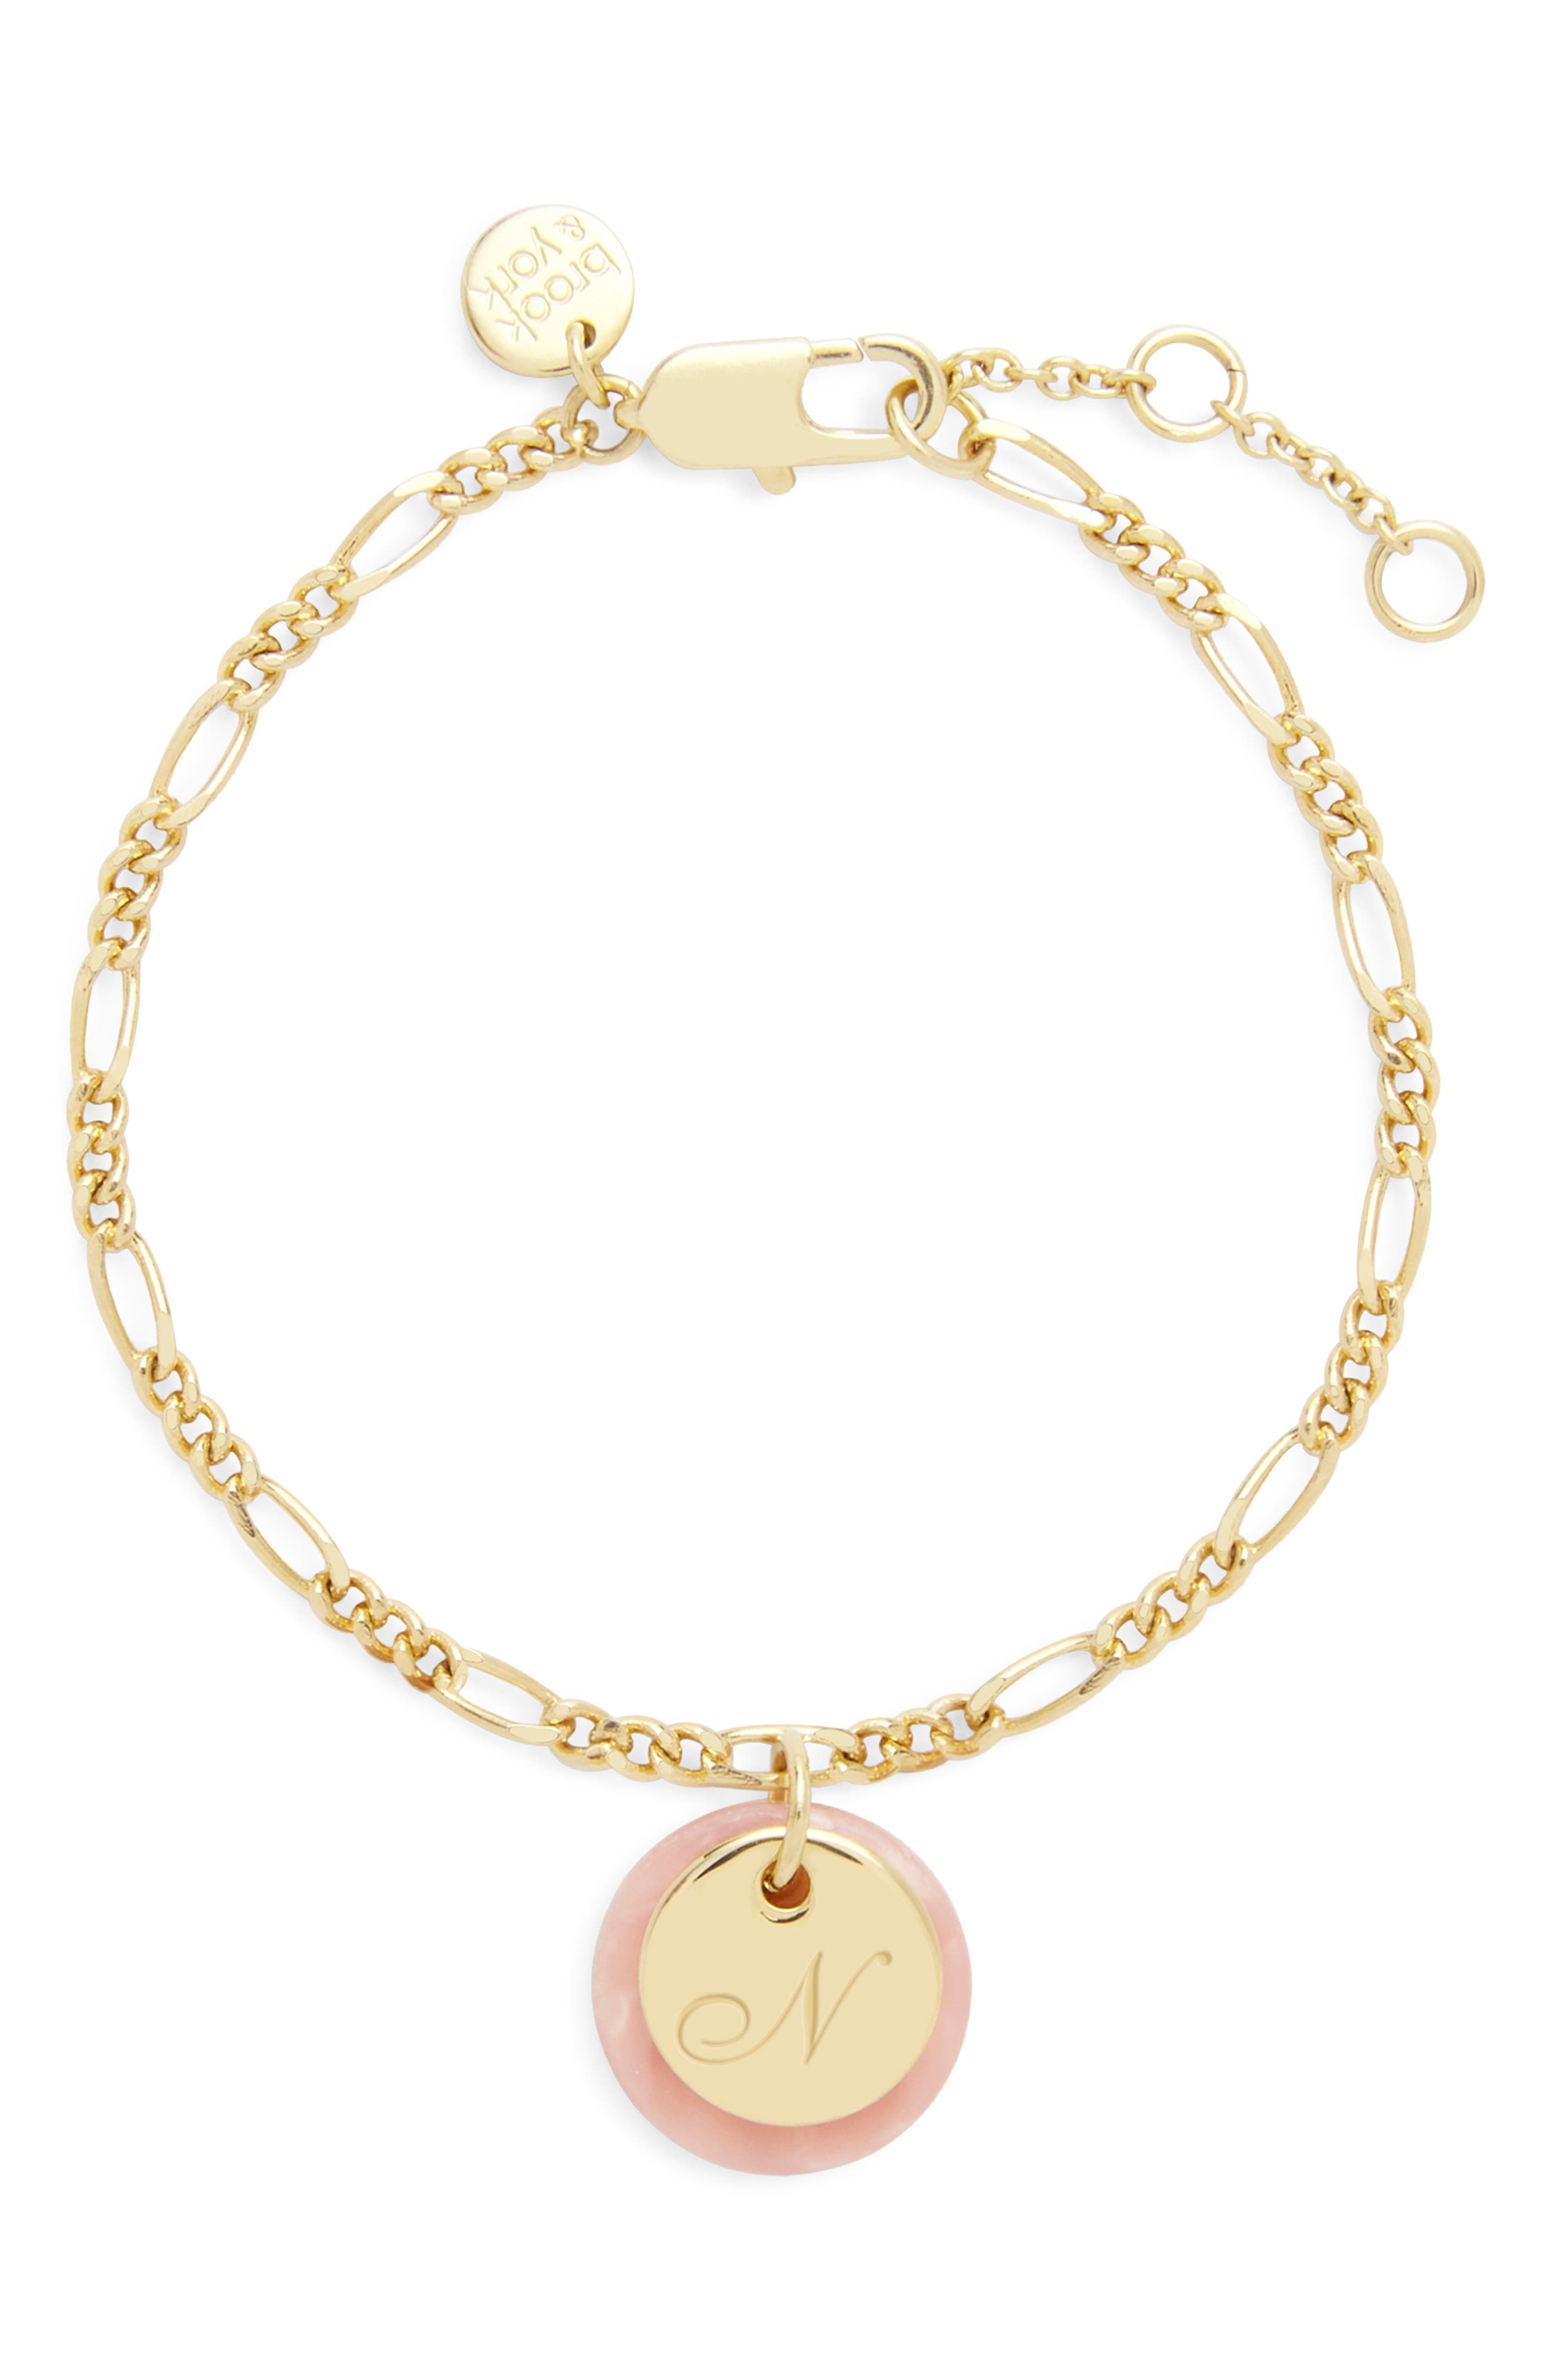 Chelsea Initial Charm Bracelet